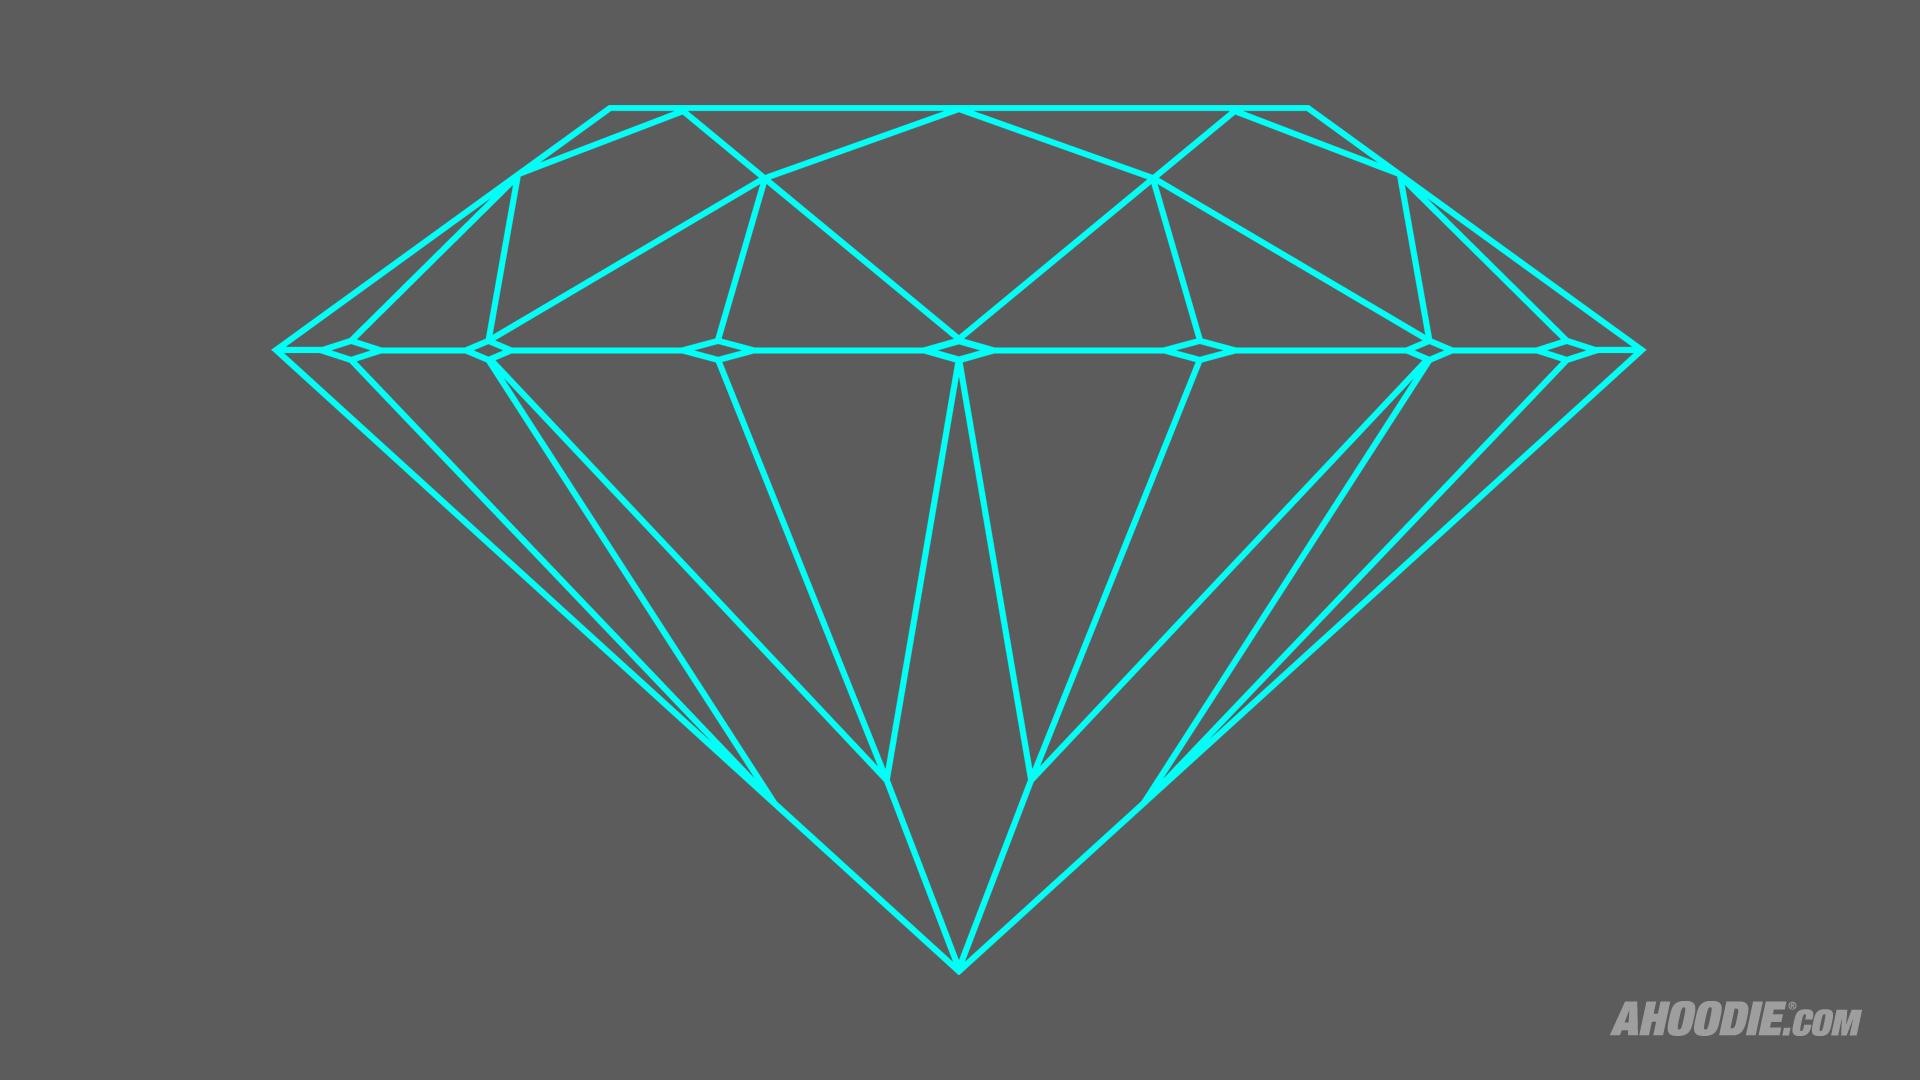 High Quality Diamond Supply Co Wallpaper